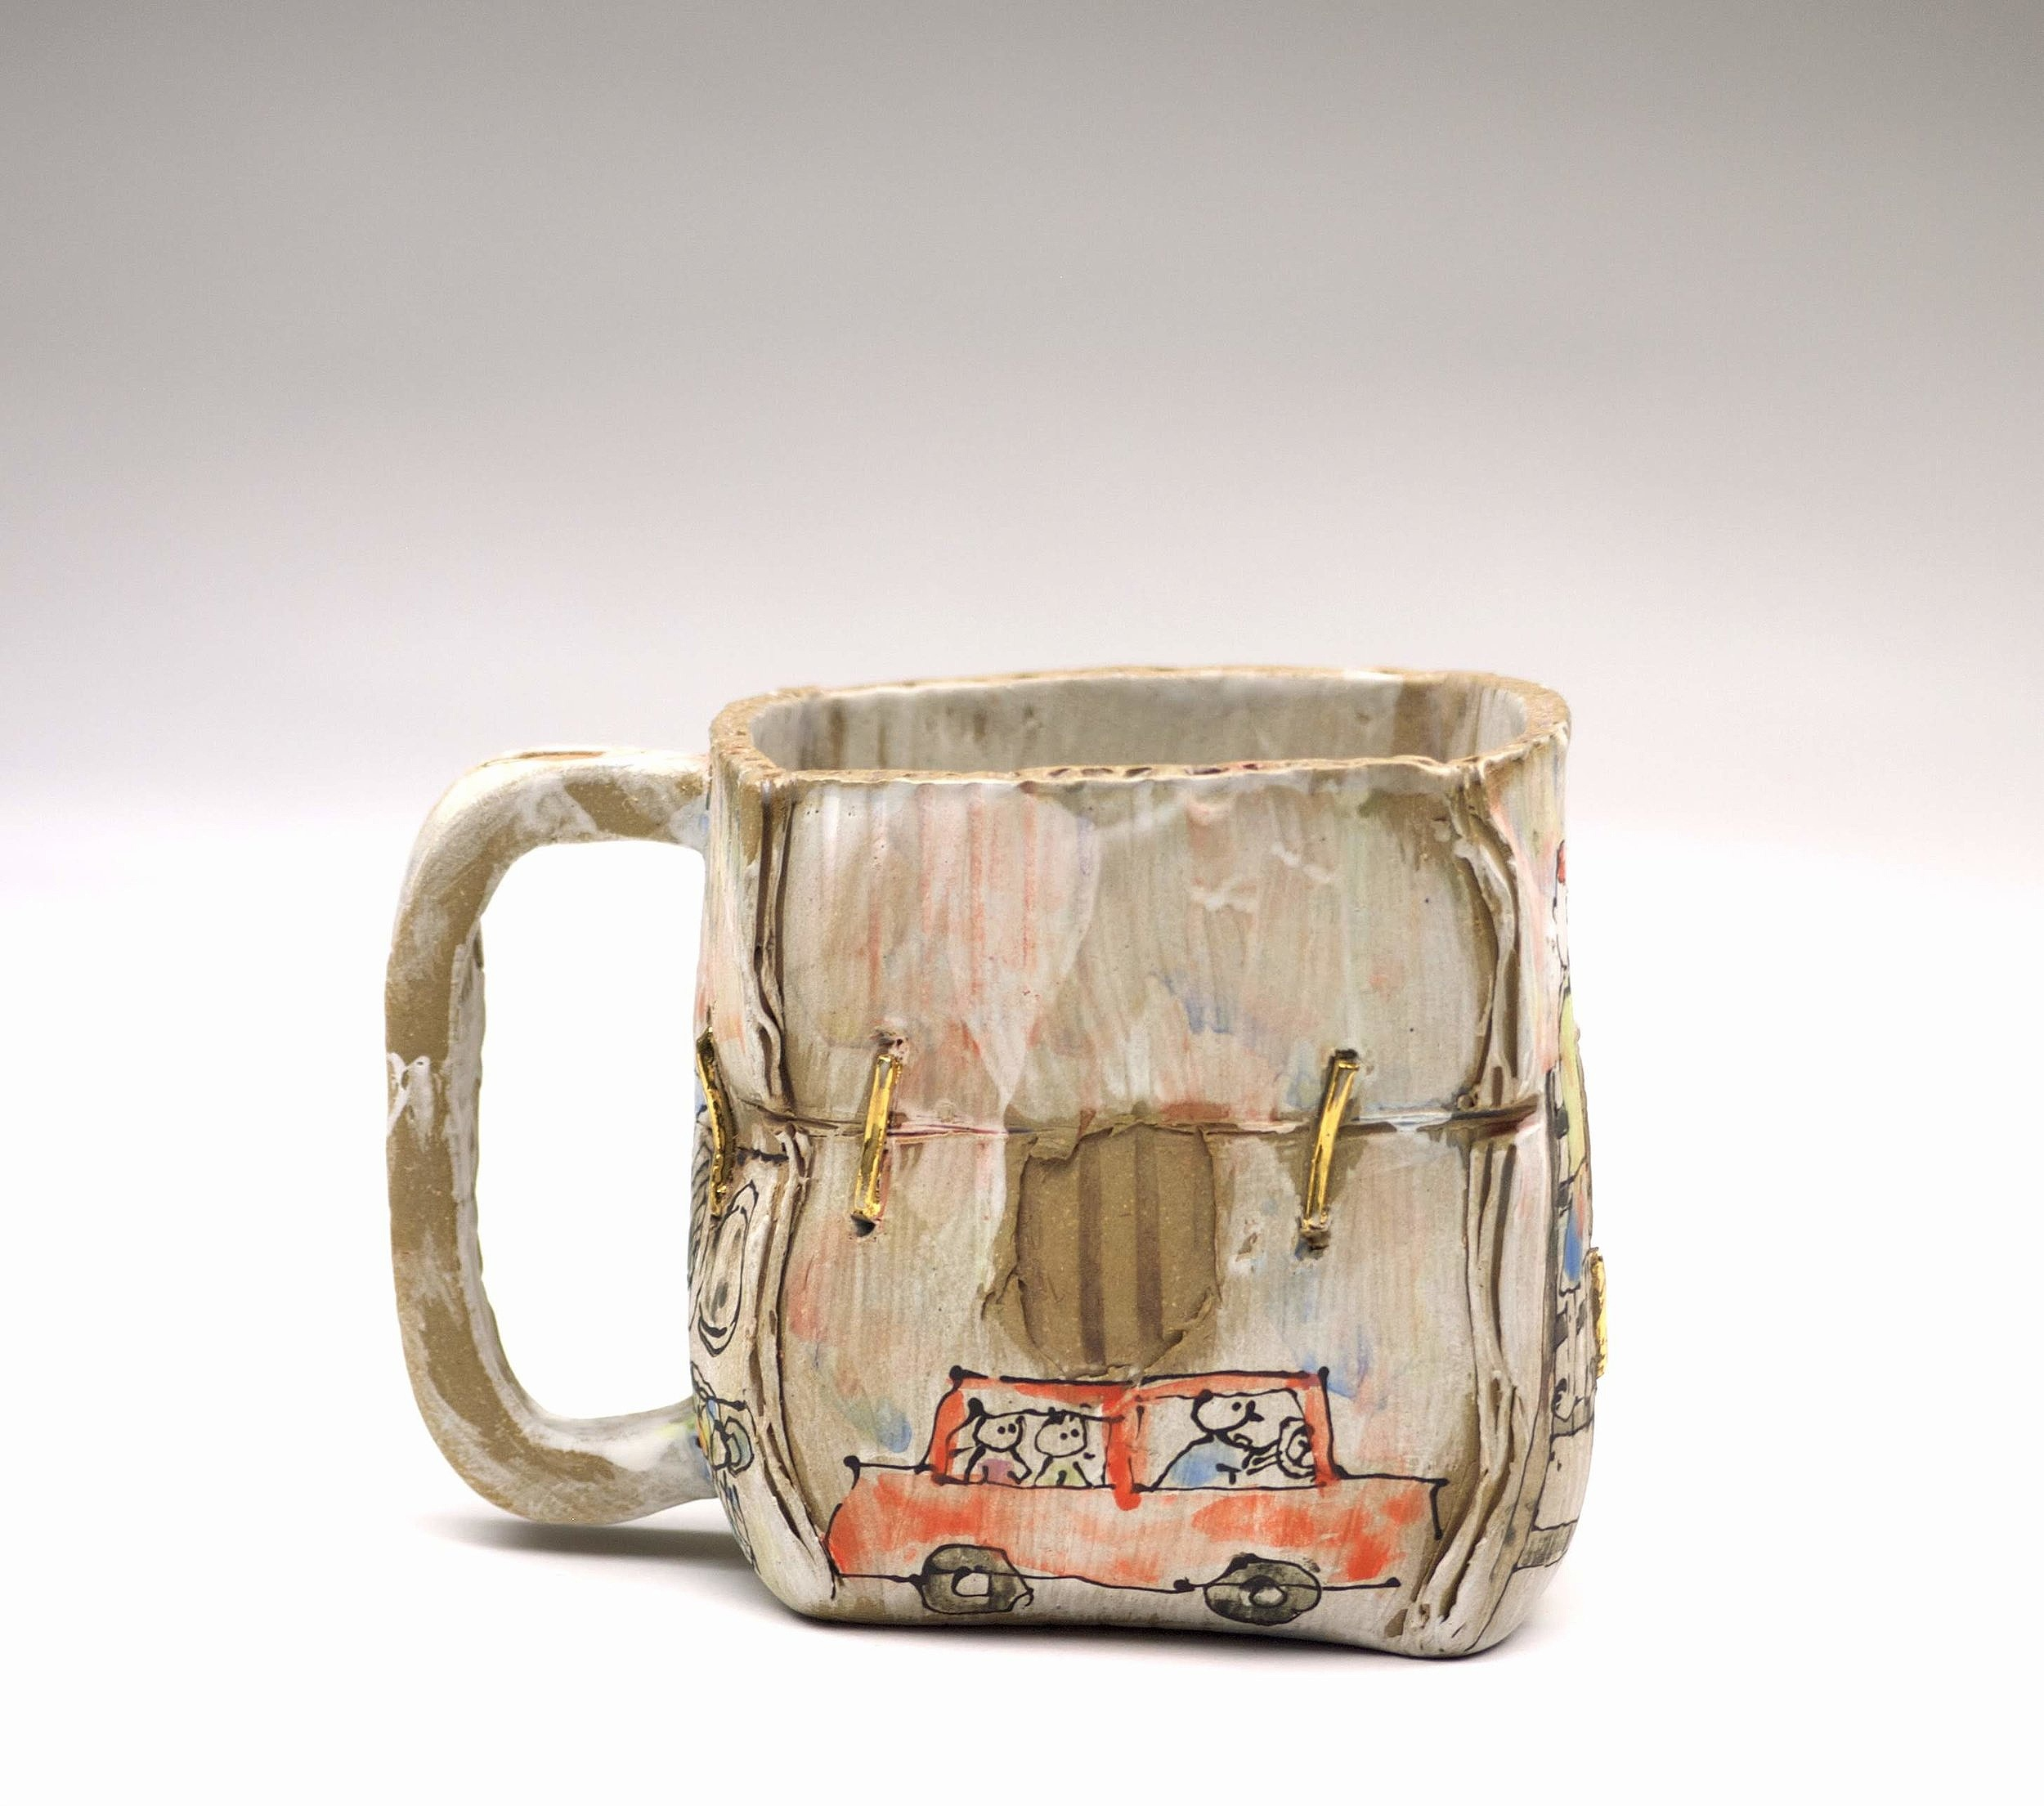 Relationships on the Mend mug